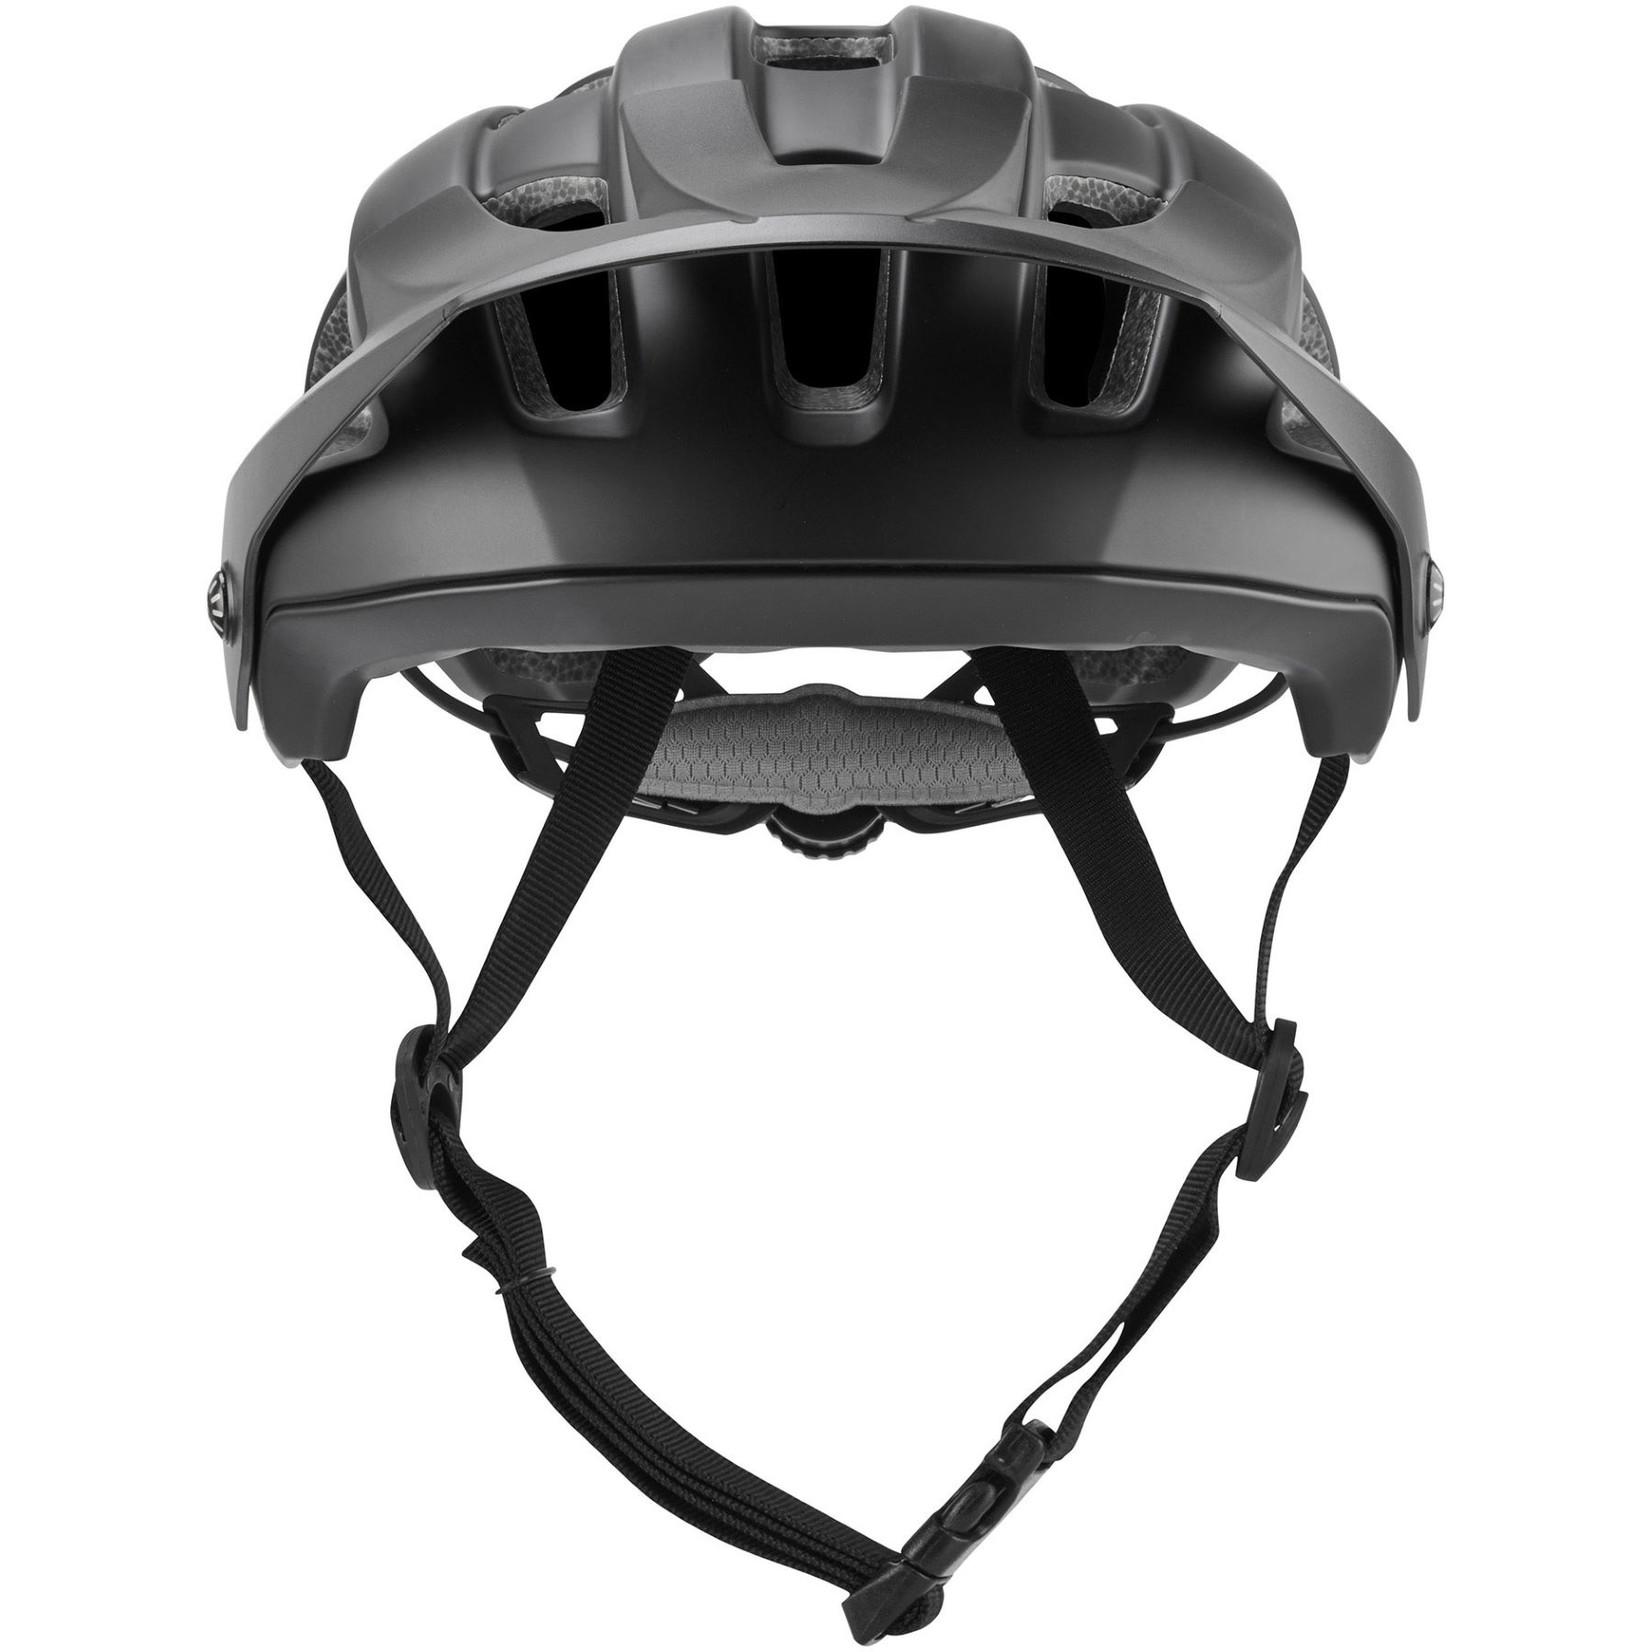 Brand-X EH1 Enduro MTB Helmet